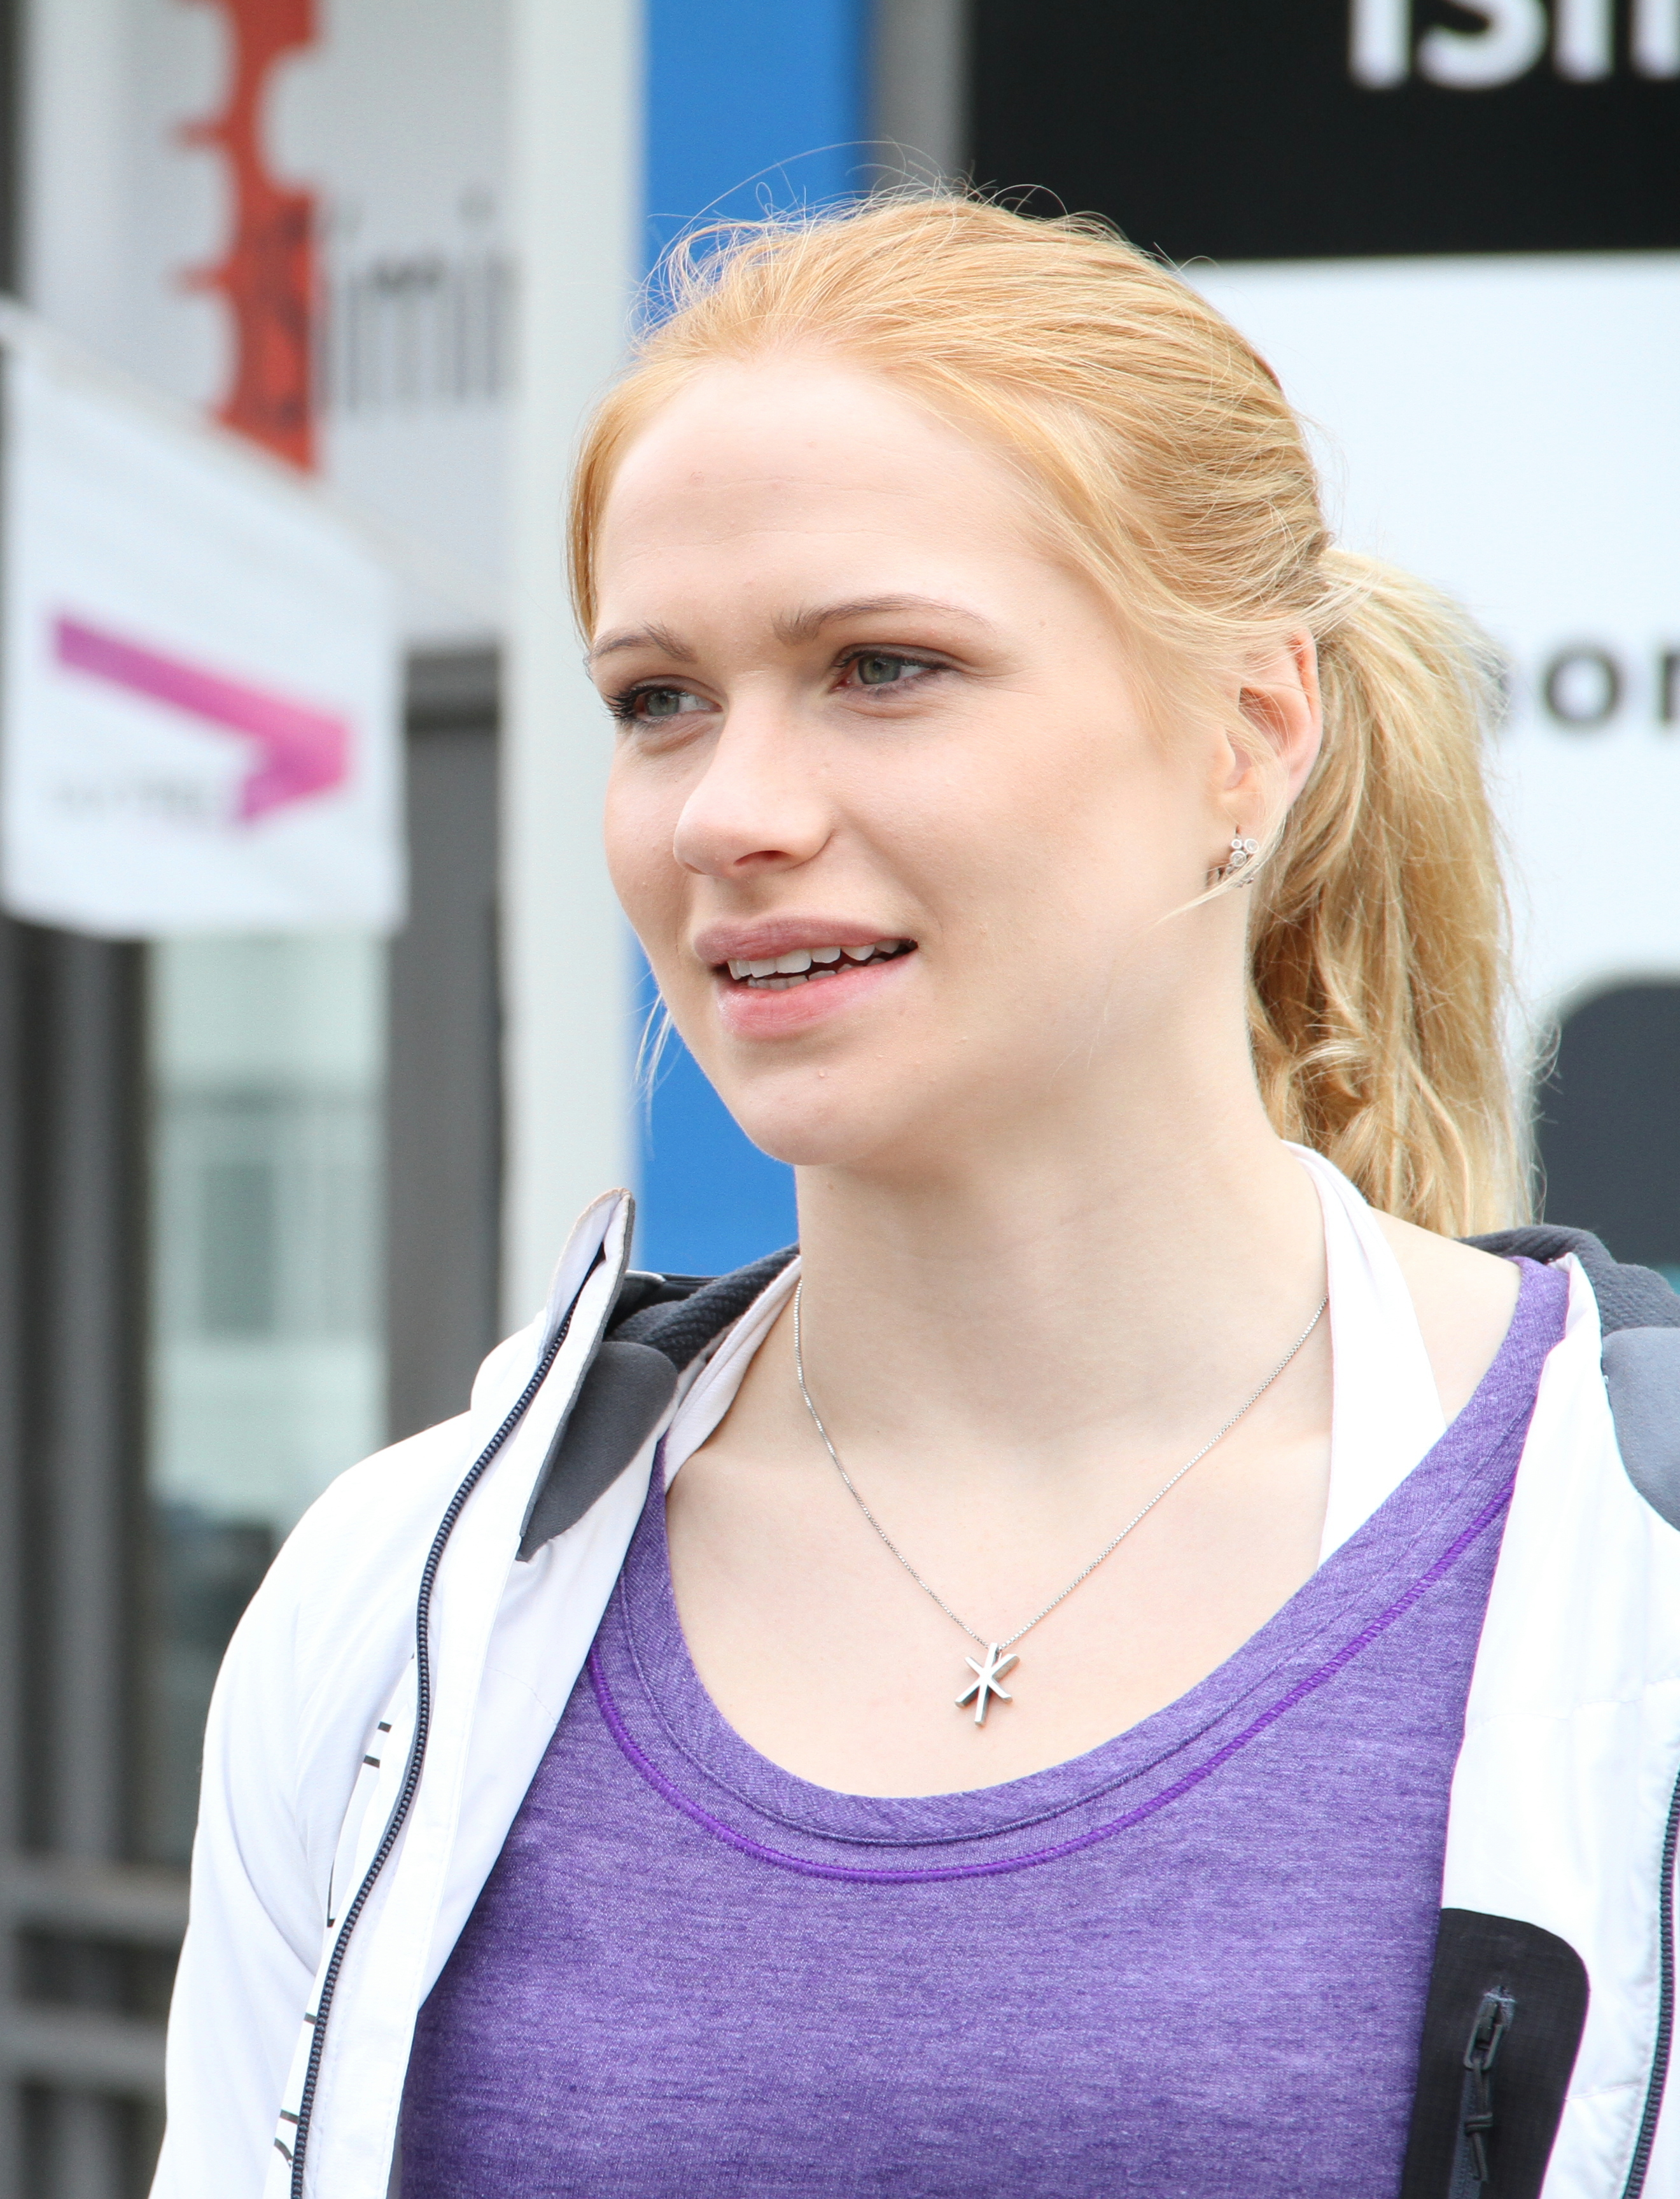 Annie thorisdottir and steroids myideasbedroom com